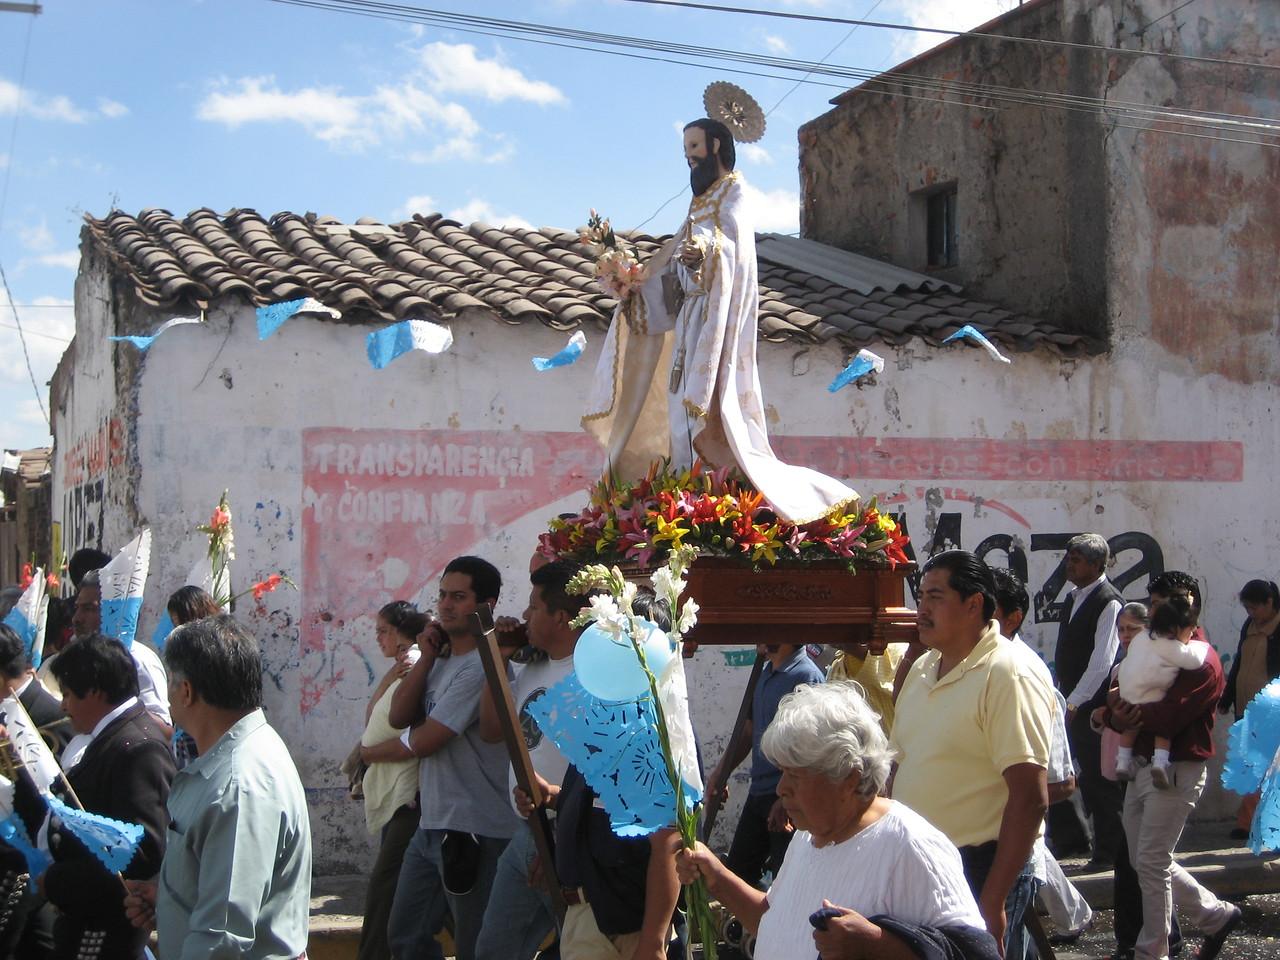 San Pablo travelled to meet La Virgen as she arrived.